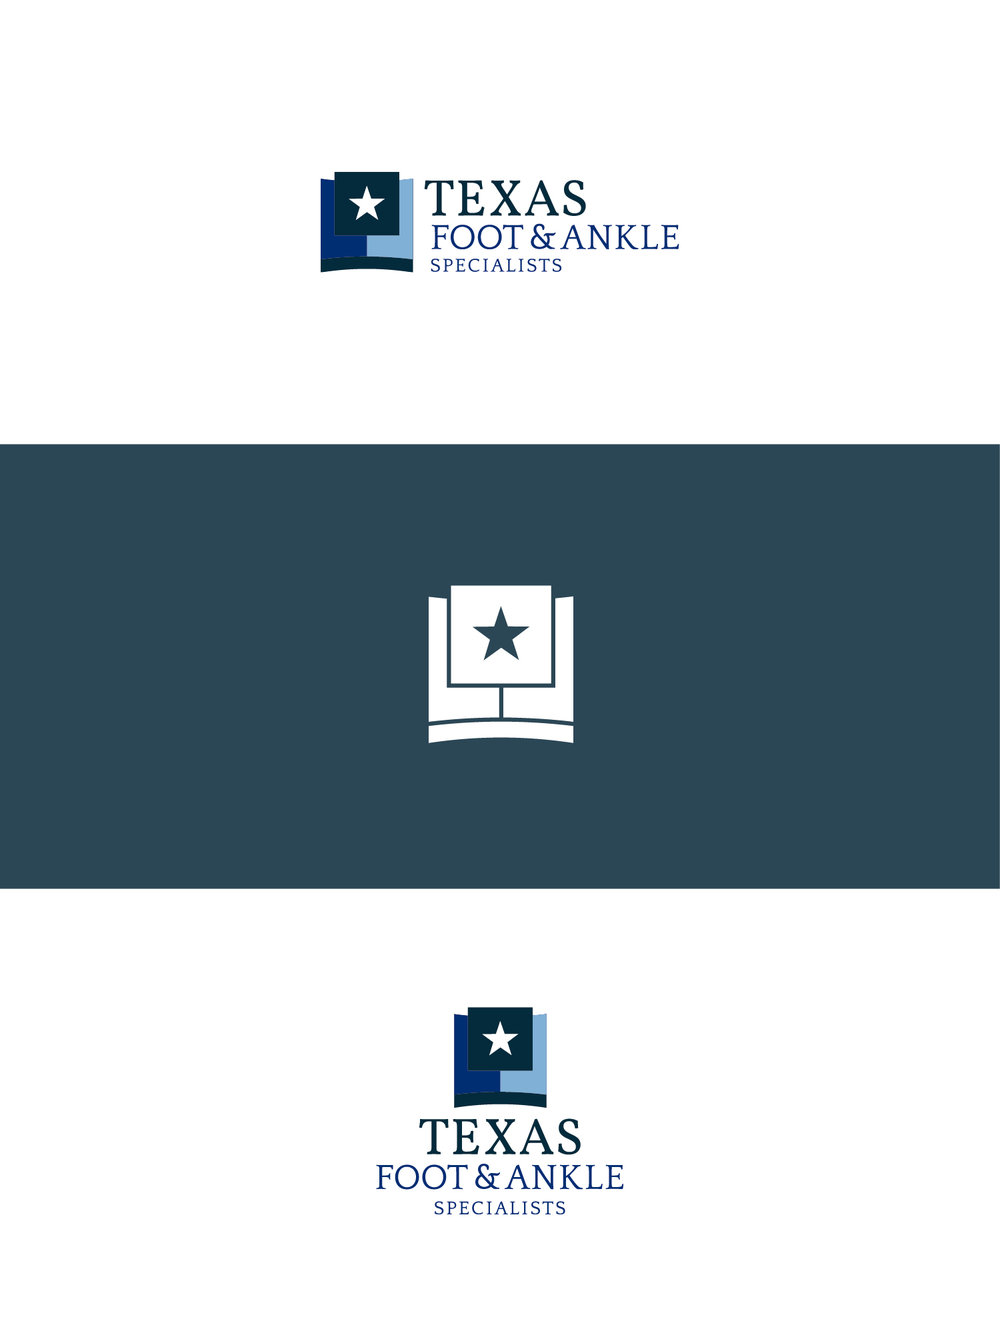 TXFAS Images.jpg